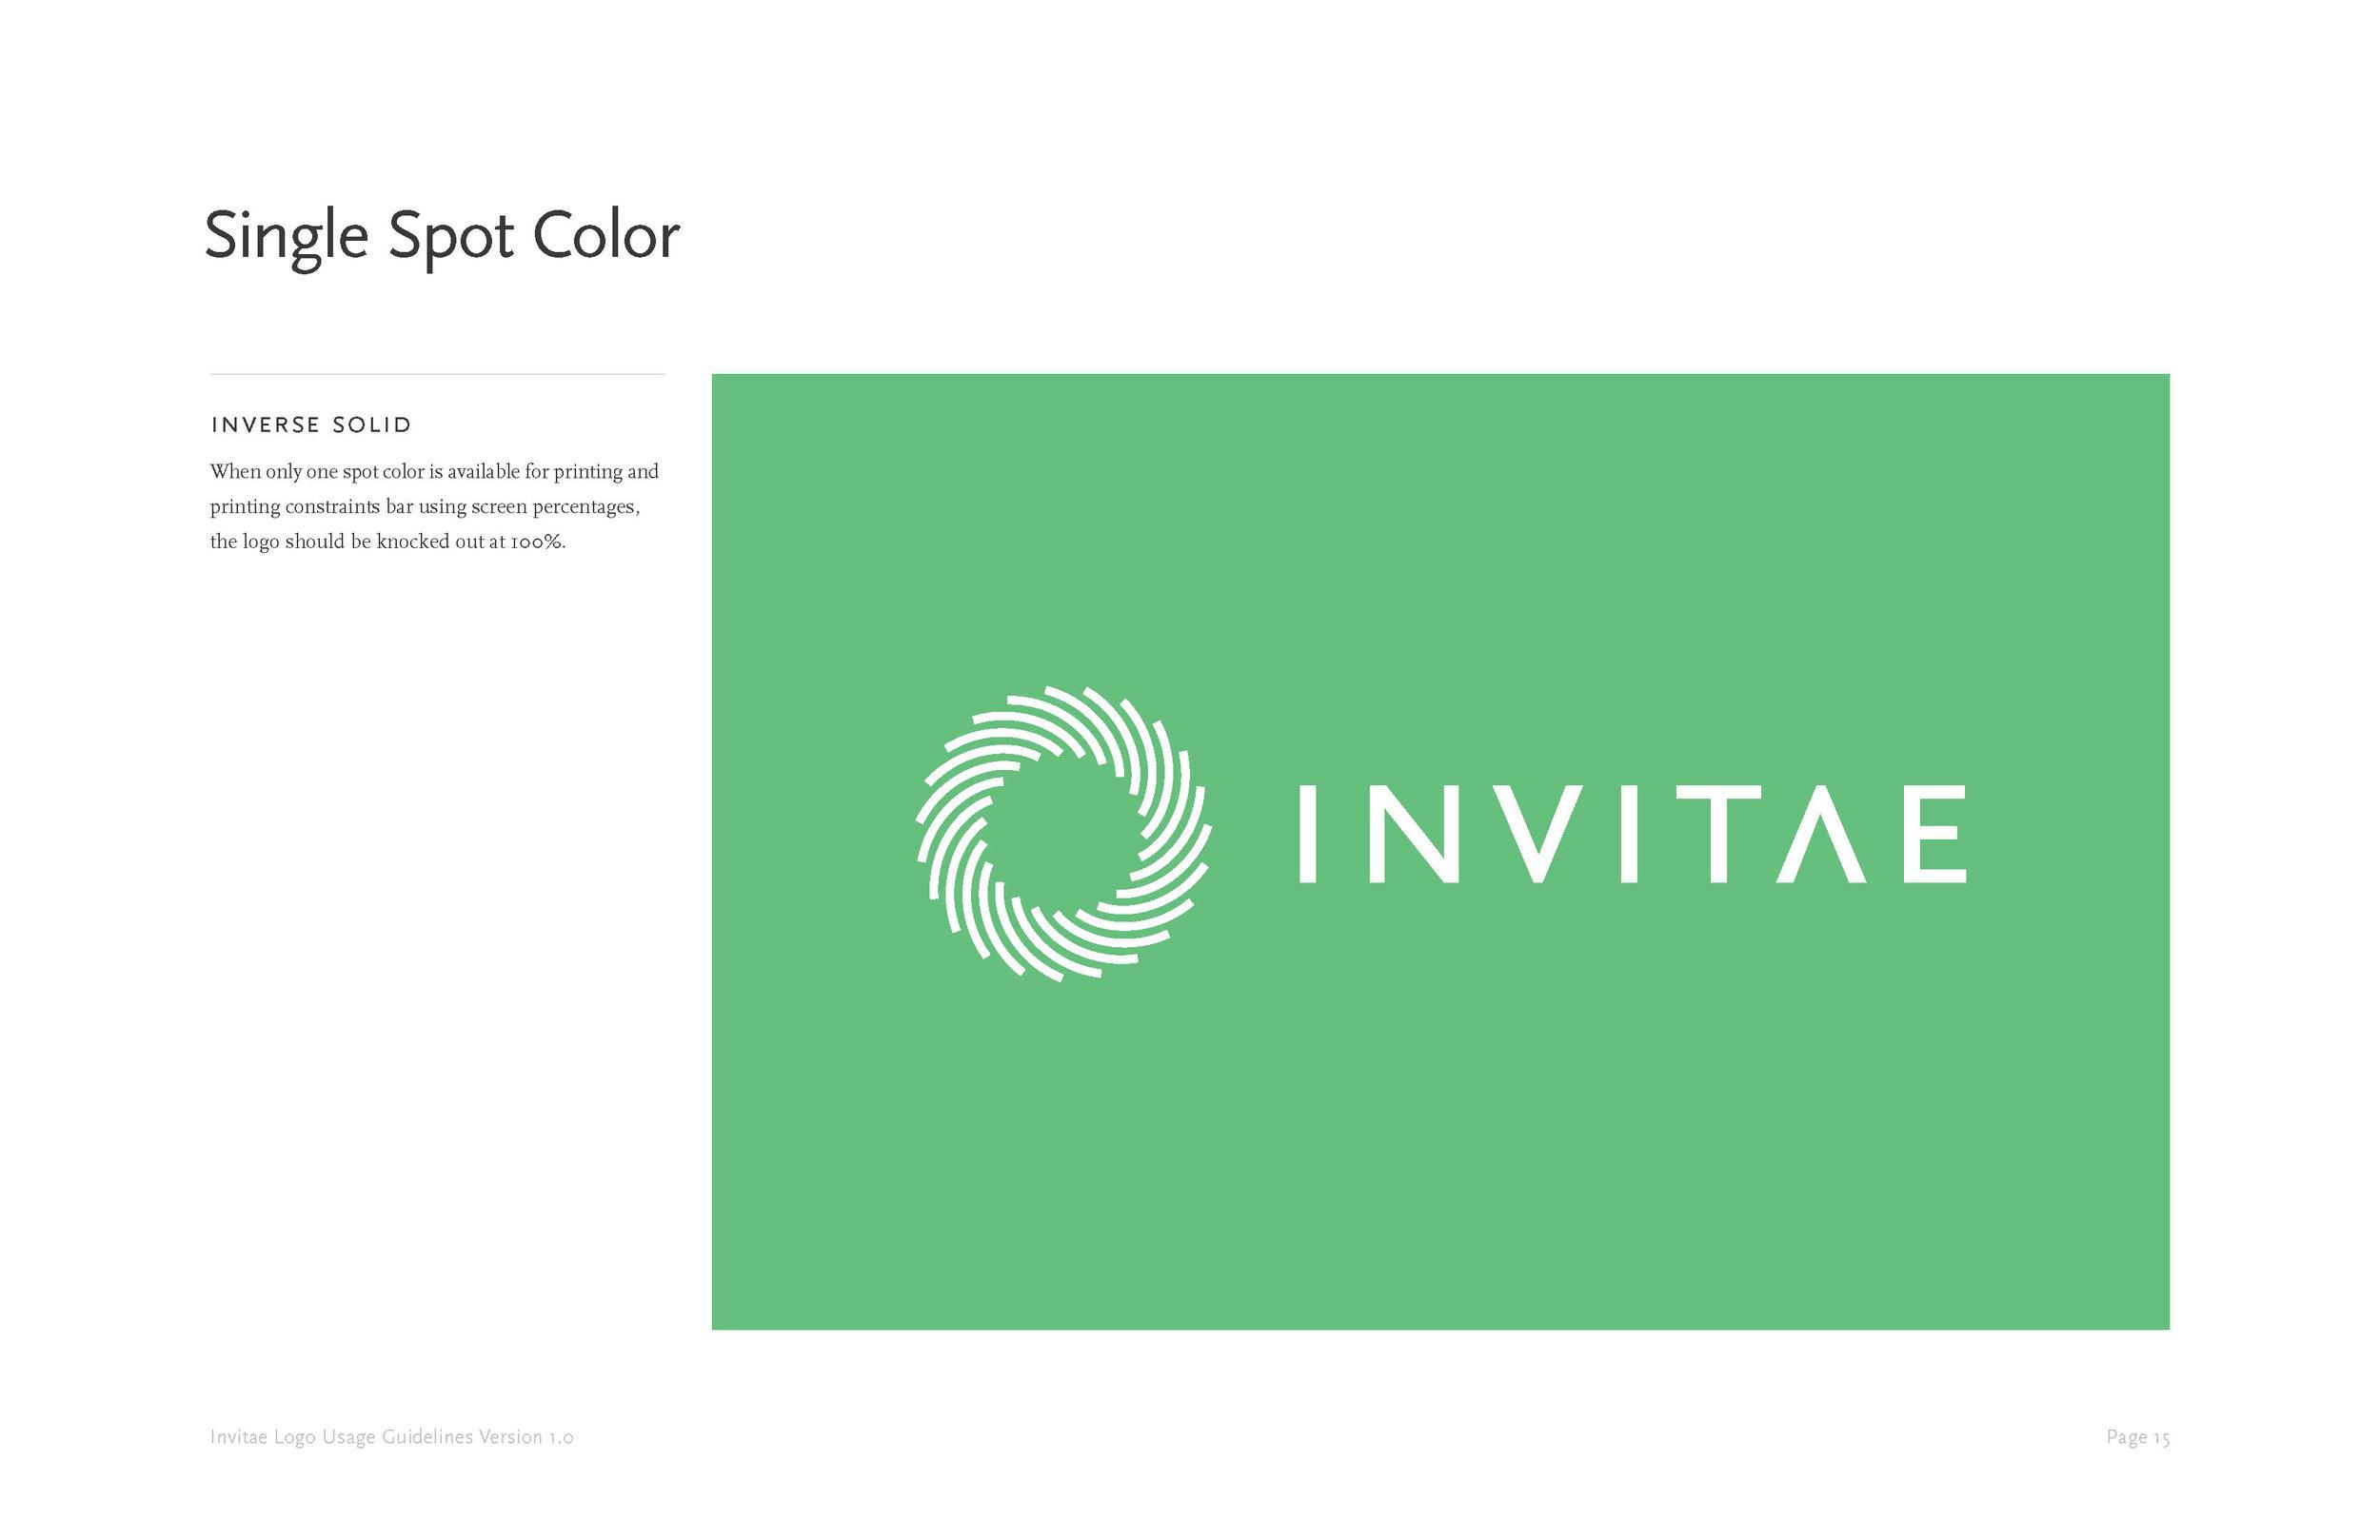 Invitae_logo_guidelines_Page_17.jpg